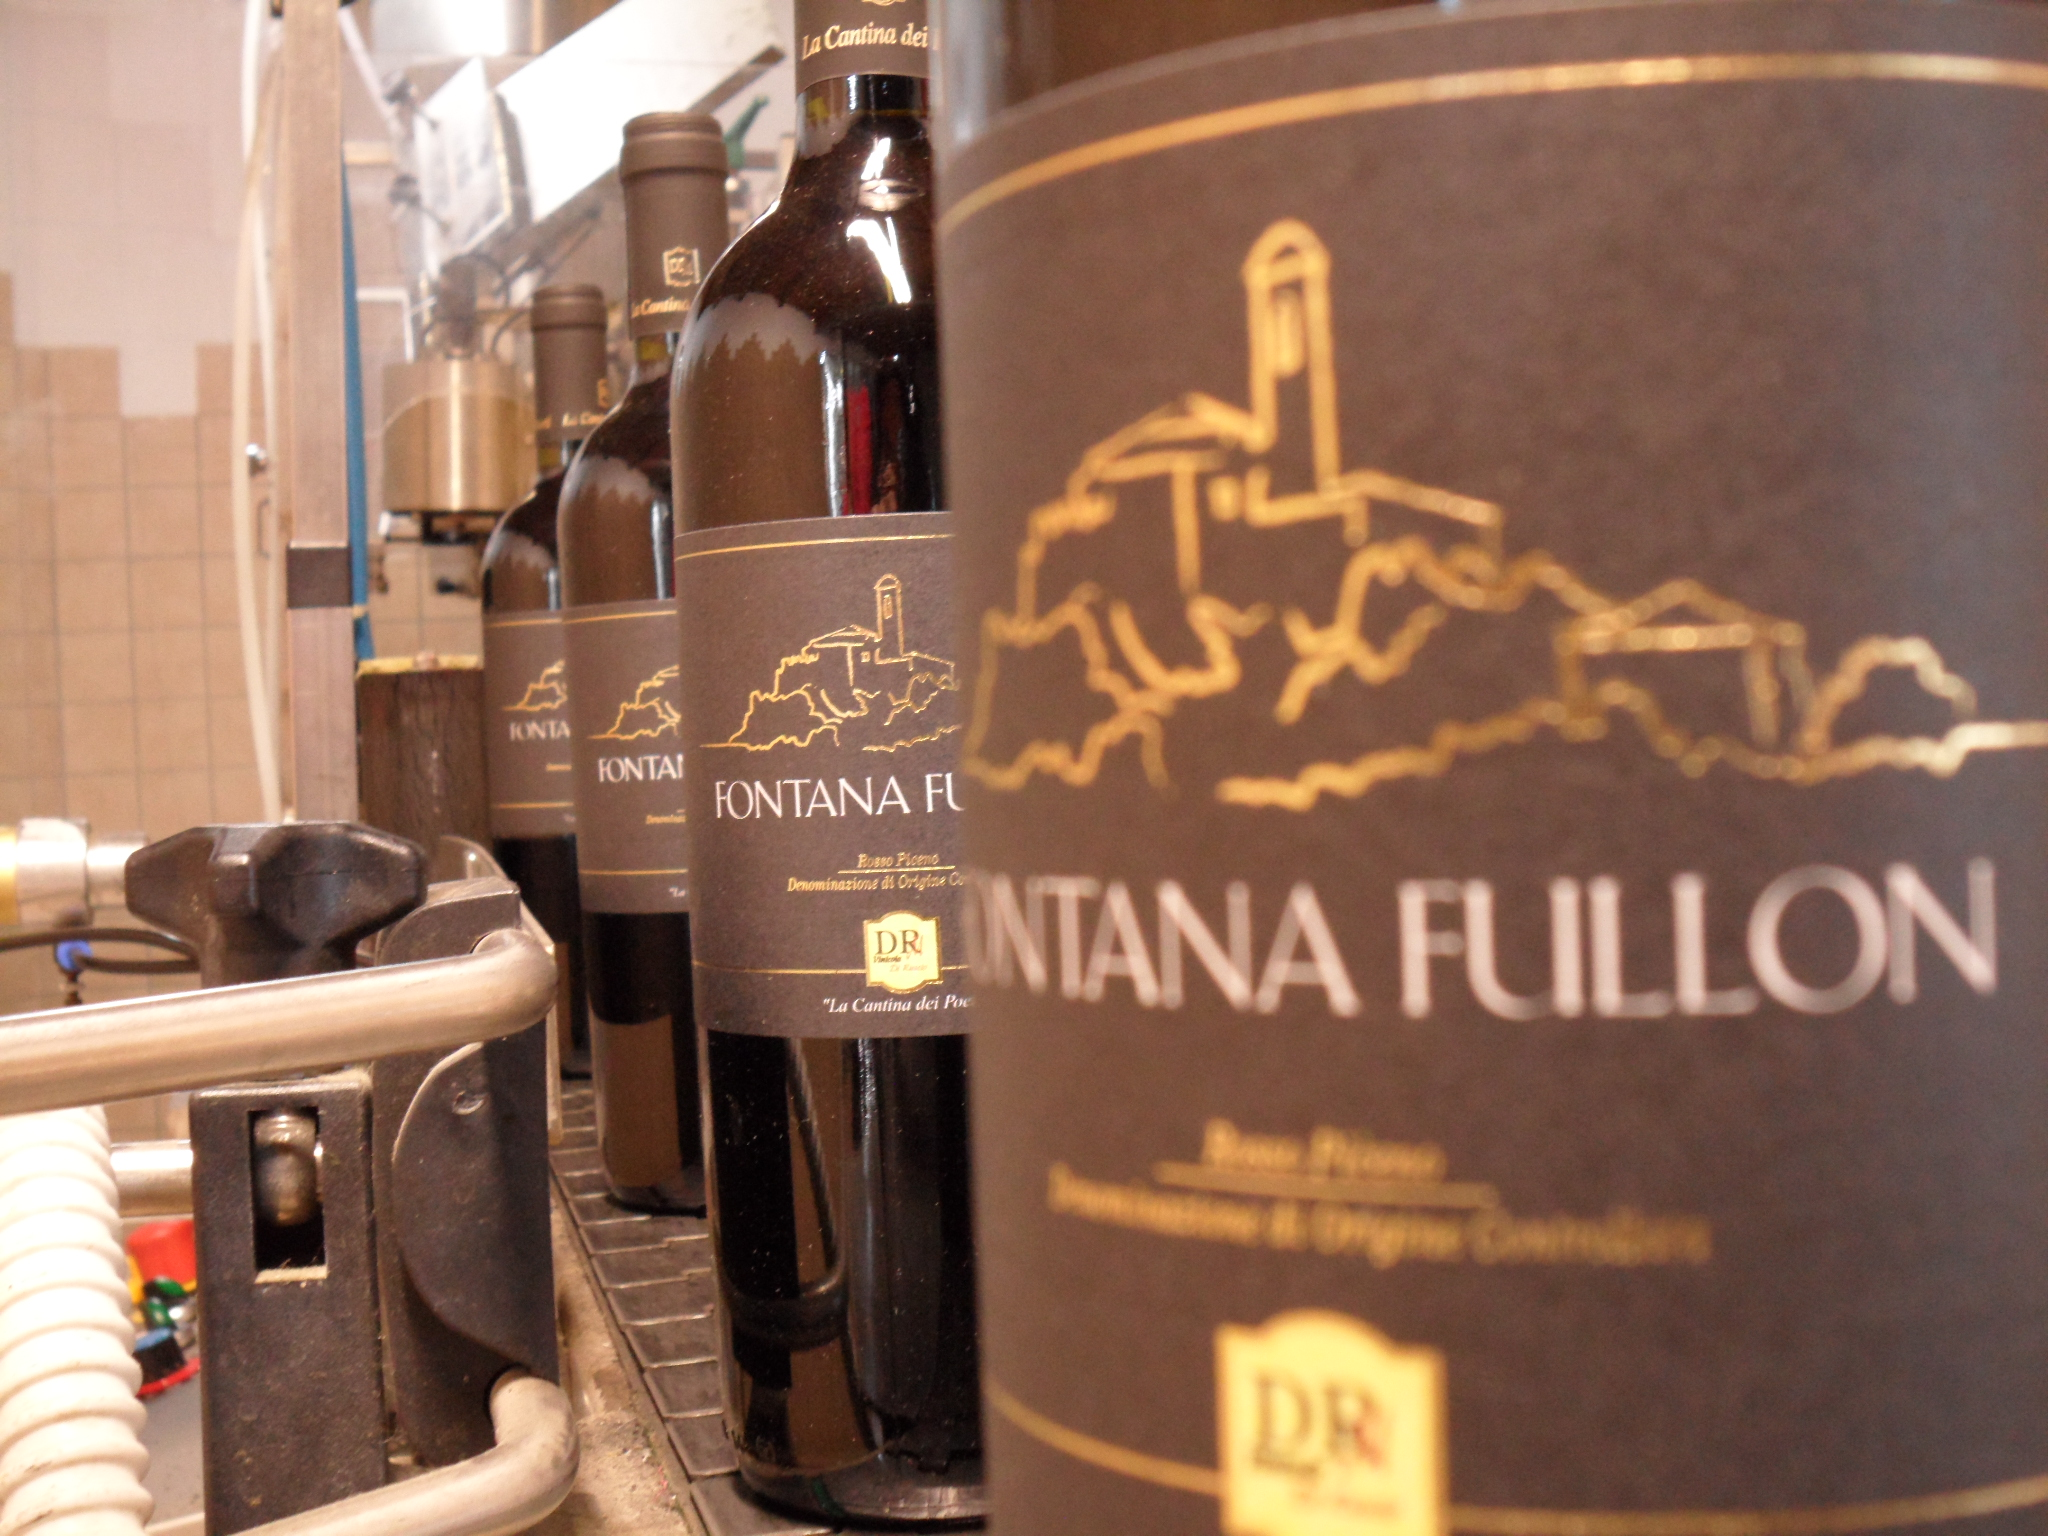 Fontana Fullon 2011